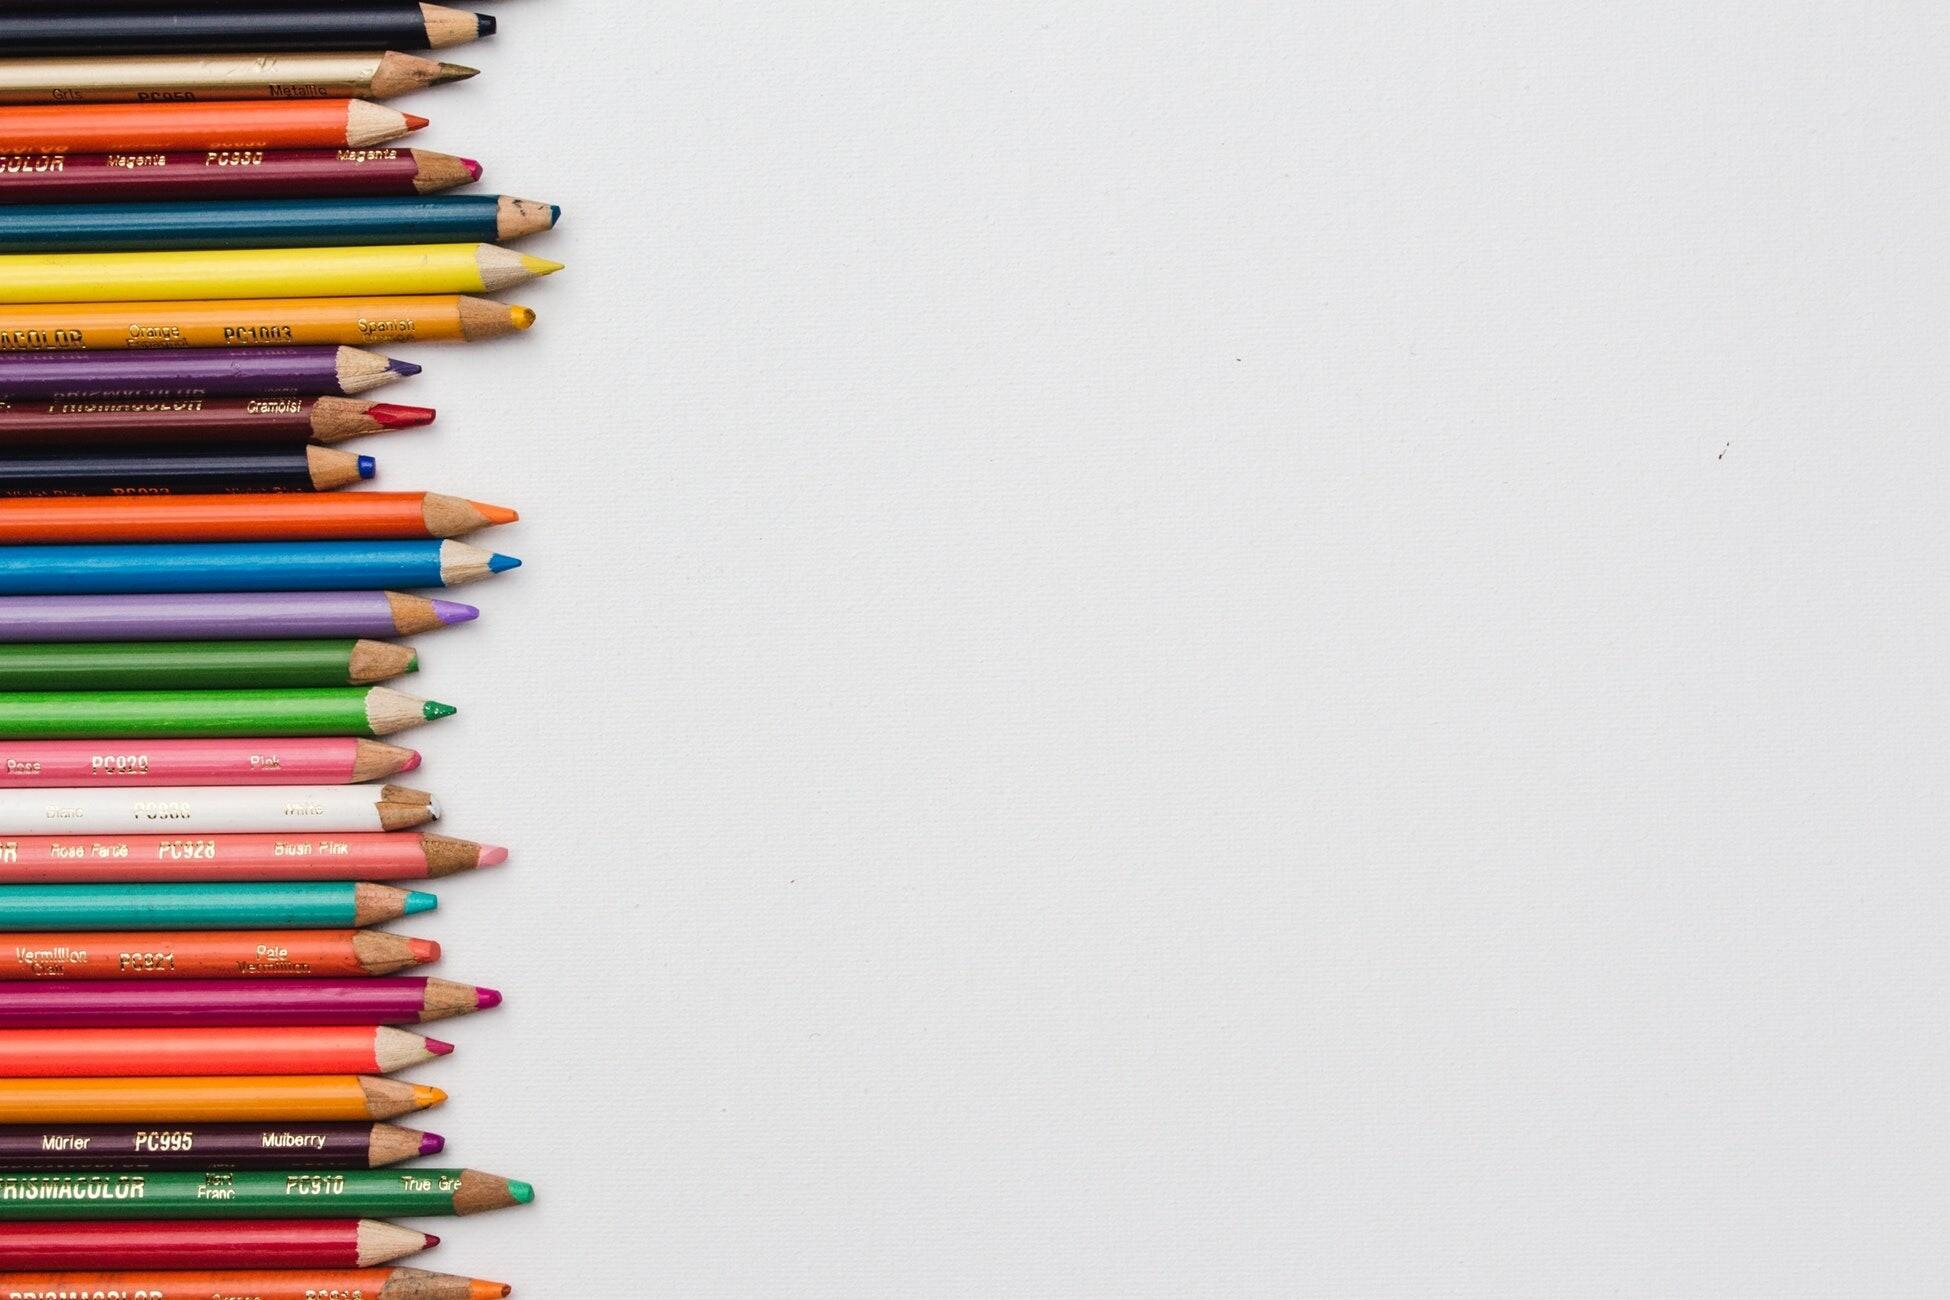 Тест: Какая цветовая гамма подойдёт вашему интерьеру?